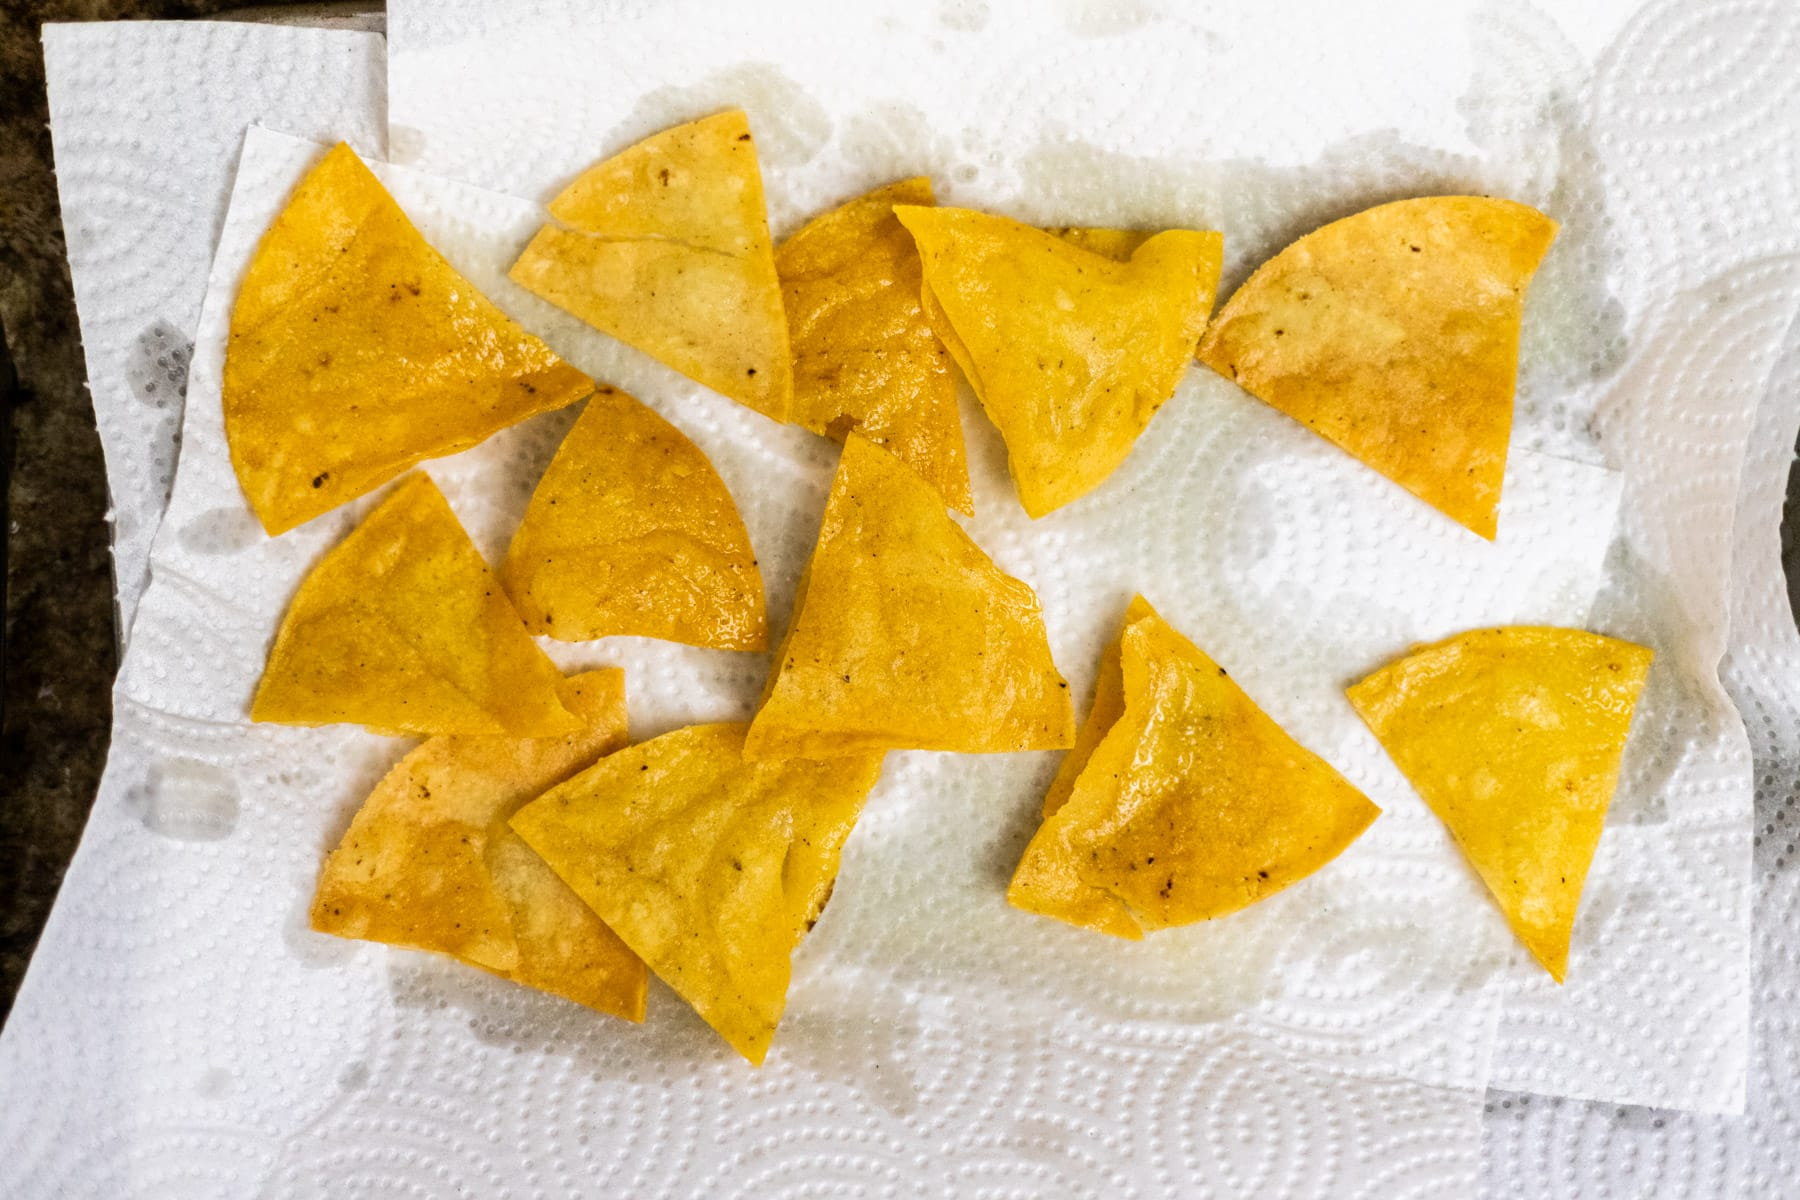 Corn tortilla chips resting on paper towel.